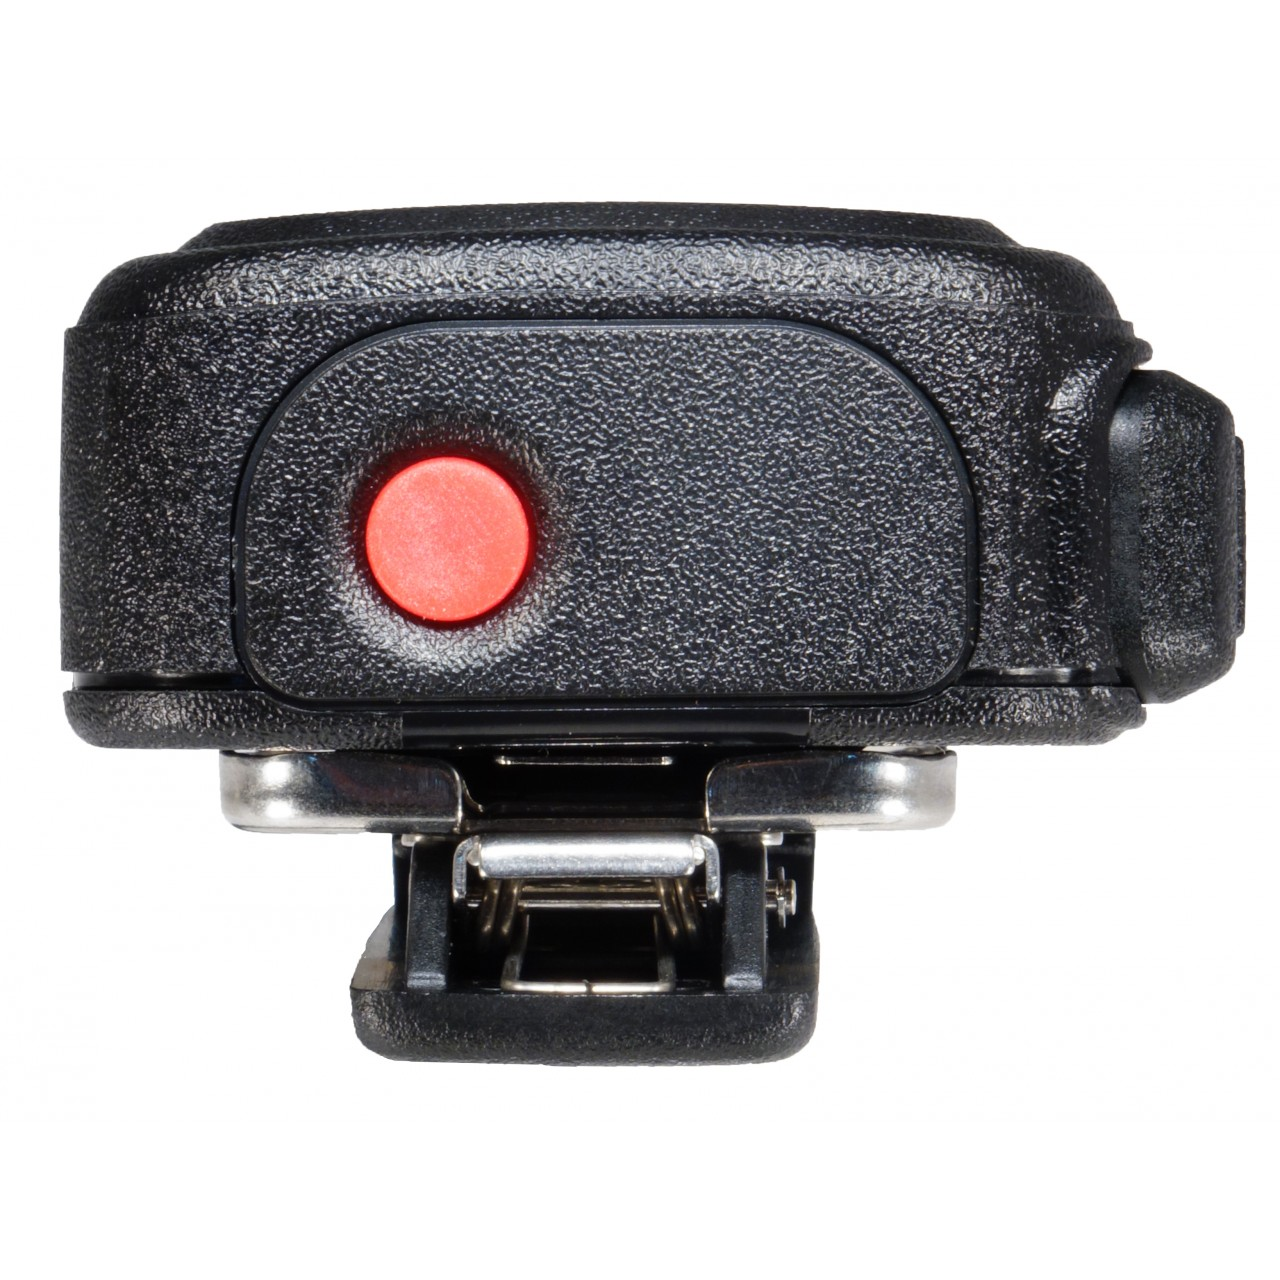 HM-SR29580 Microphones - ICOM